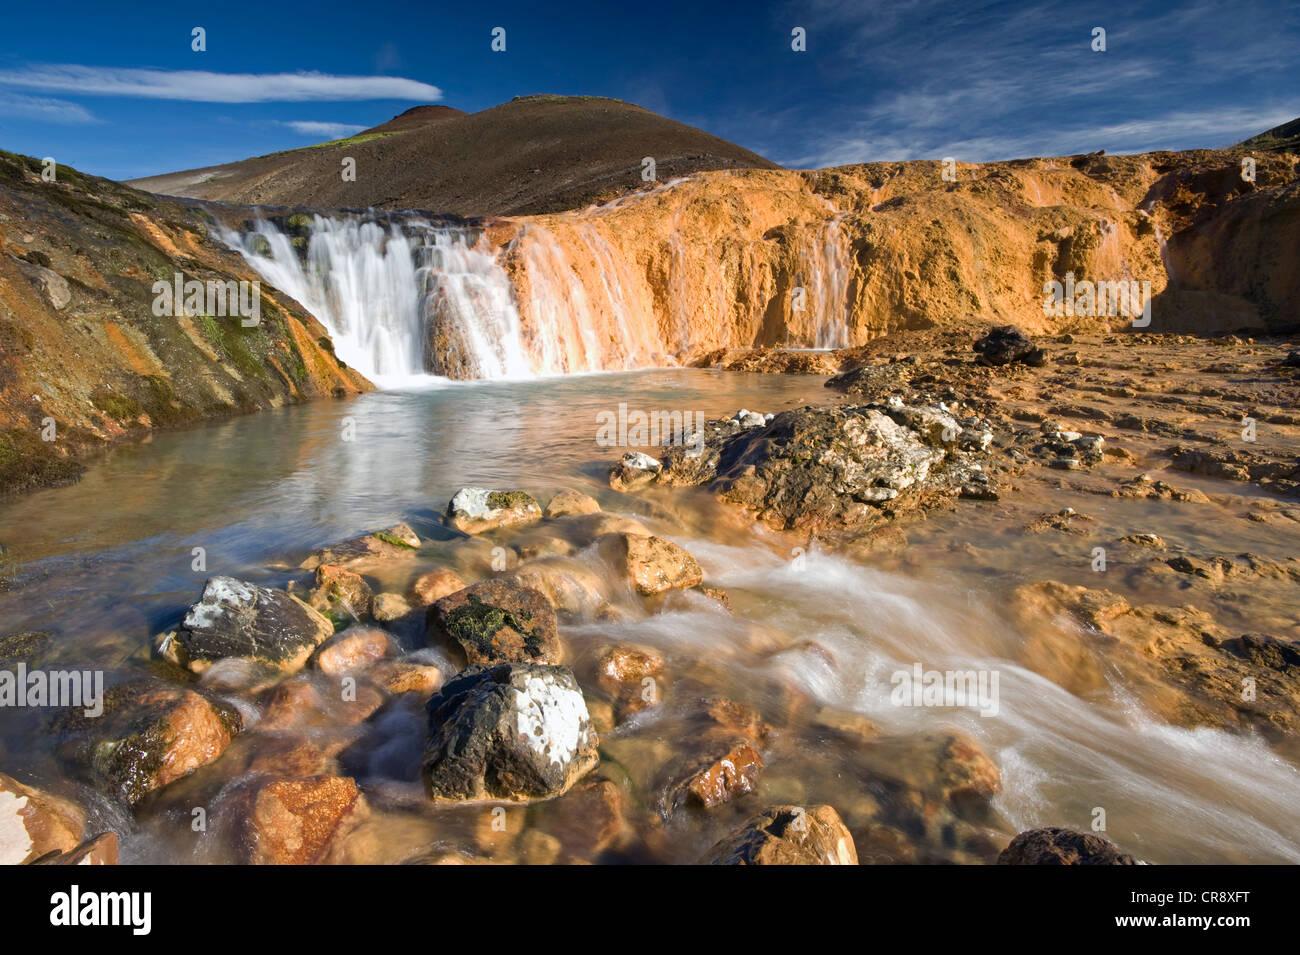 Bicolored waterfall near Hauhverir, Fjallabak Nature Reserve, Highlands of Iceland, Iceland, Europe Stock Photo